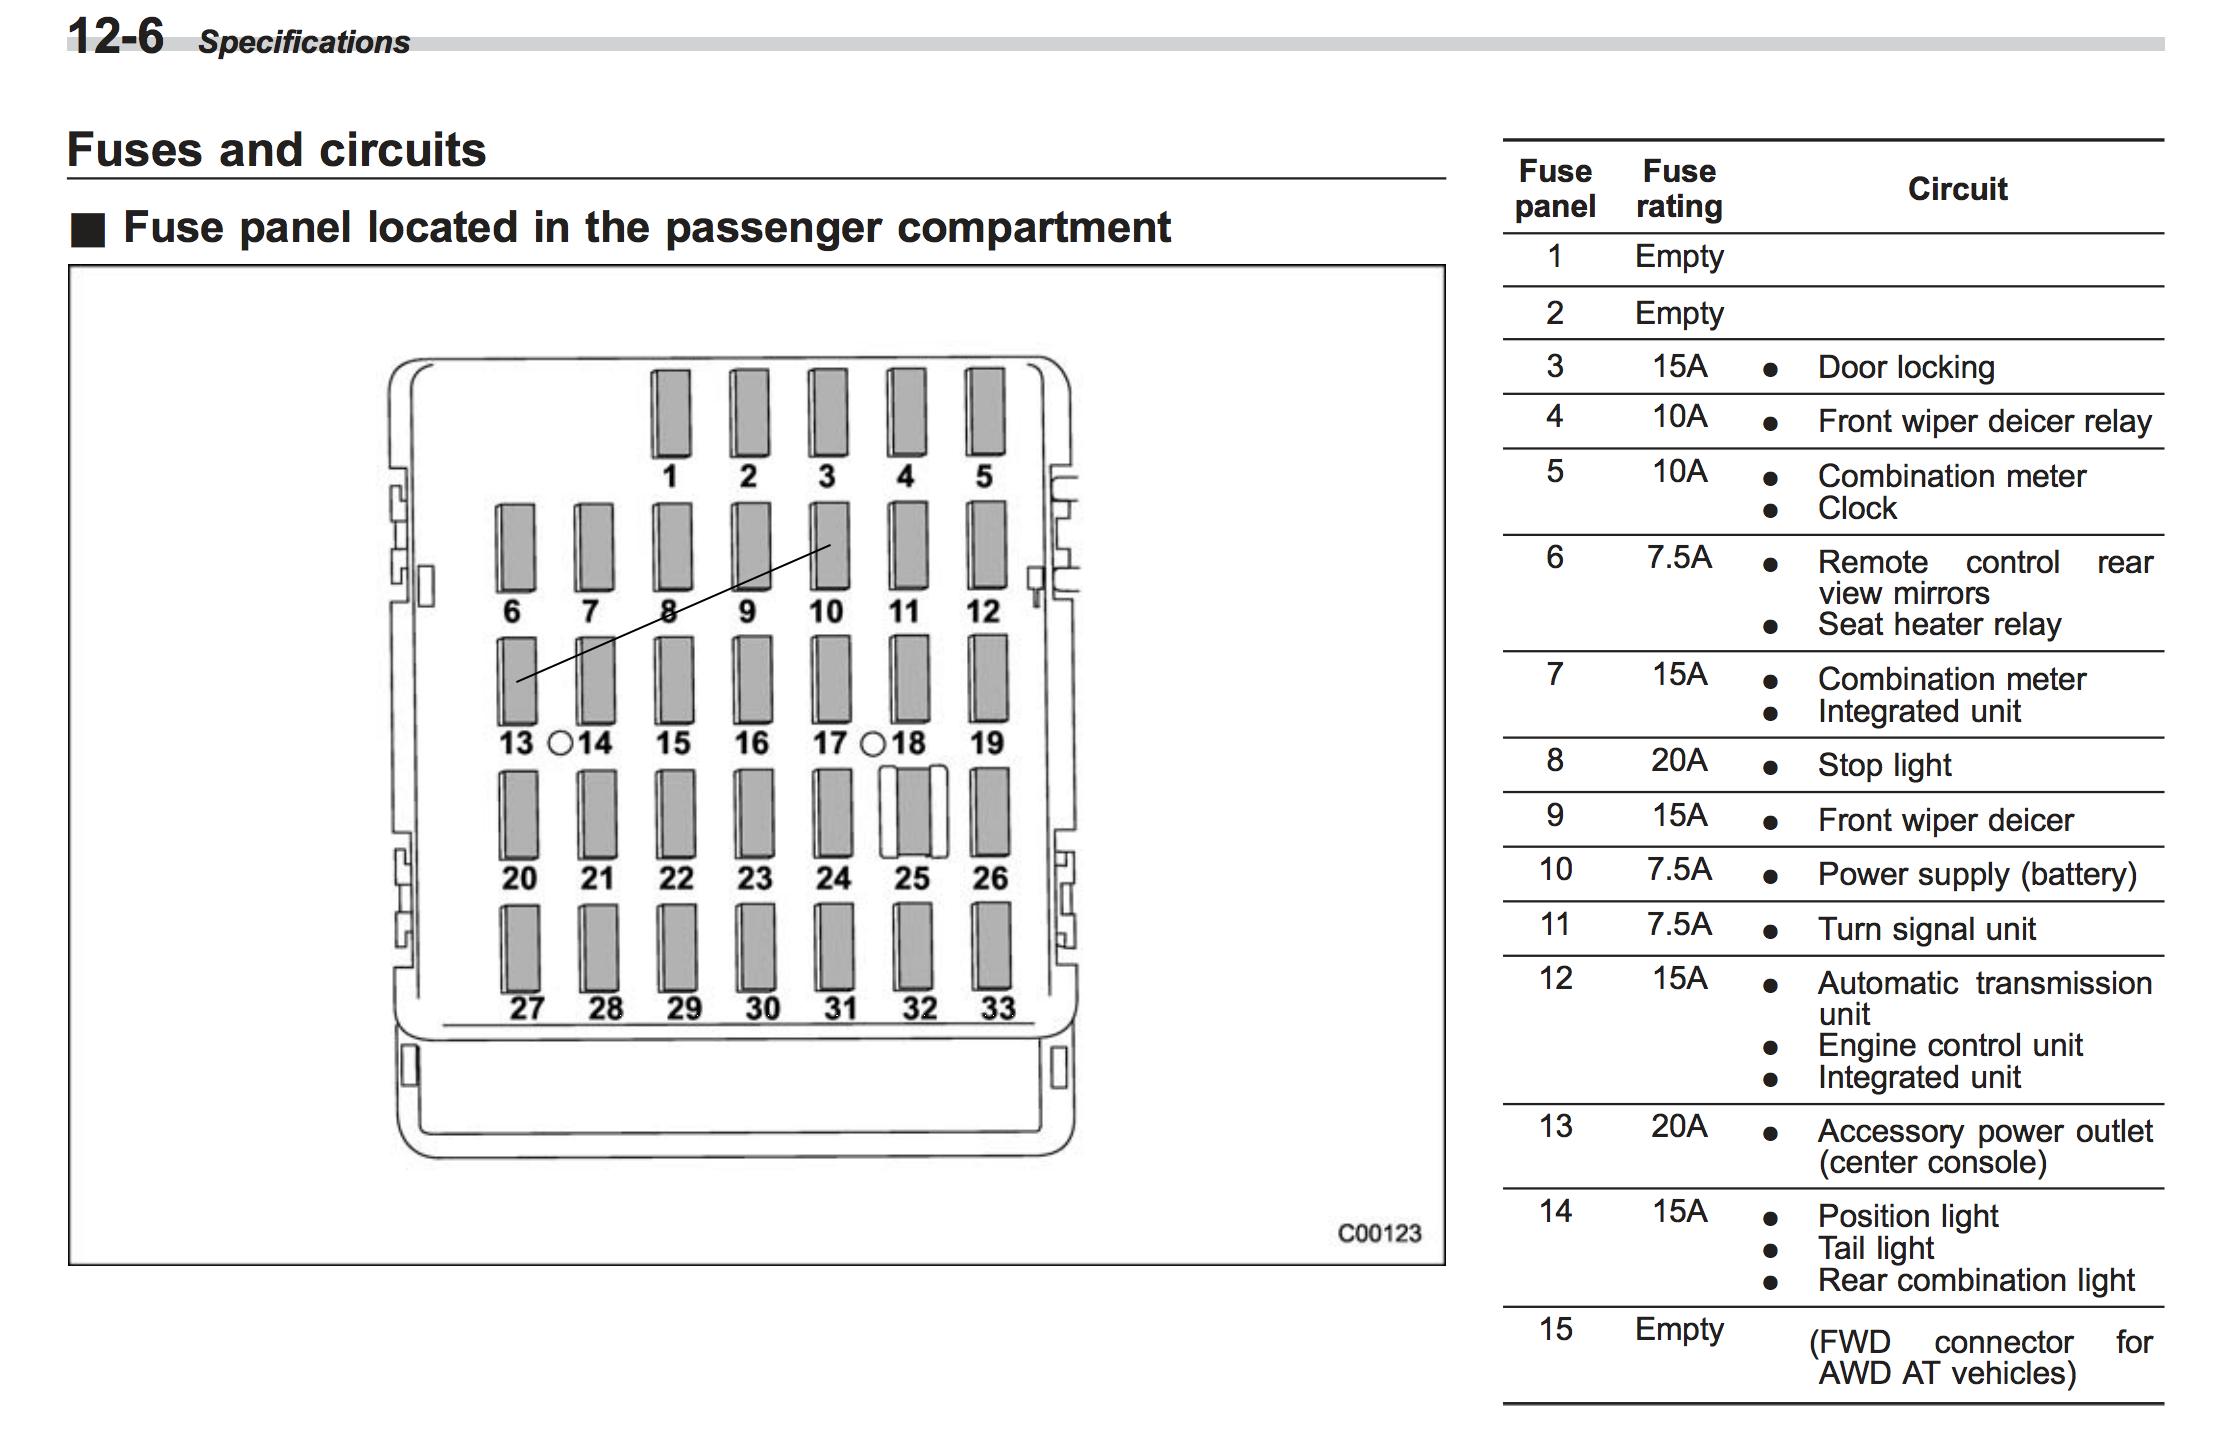 93 subaru legacy fuse diagram wiring diagram progresif rh 10 nert l a car dip de